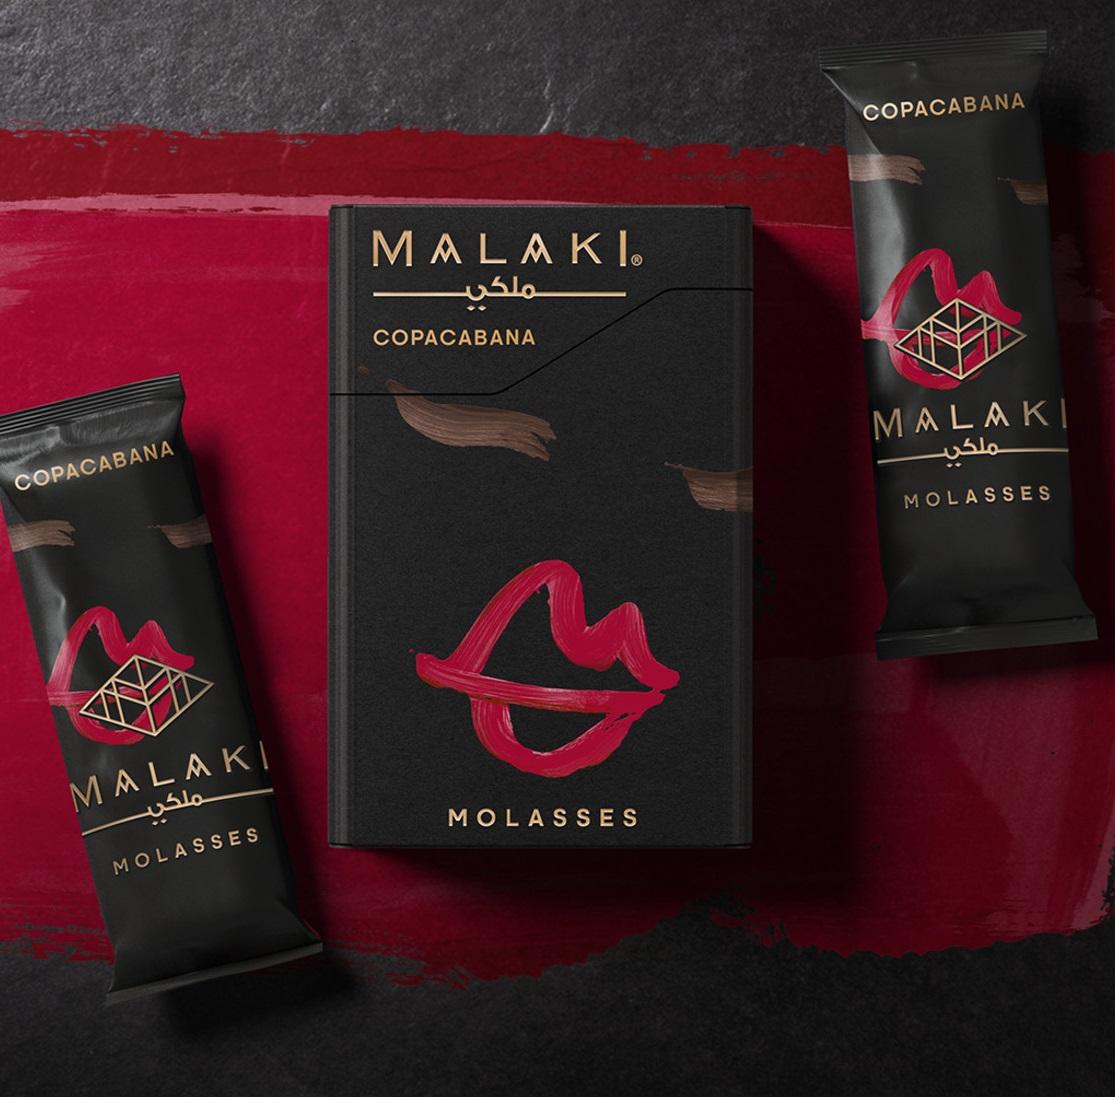 MALAKI / Copacabana(Berry系のMix、個々の香りやMixのバランスが絶妙)